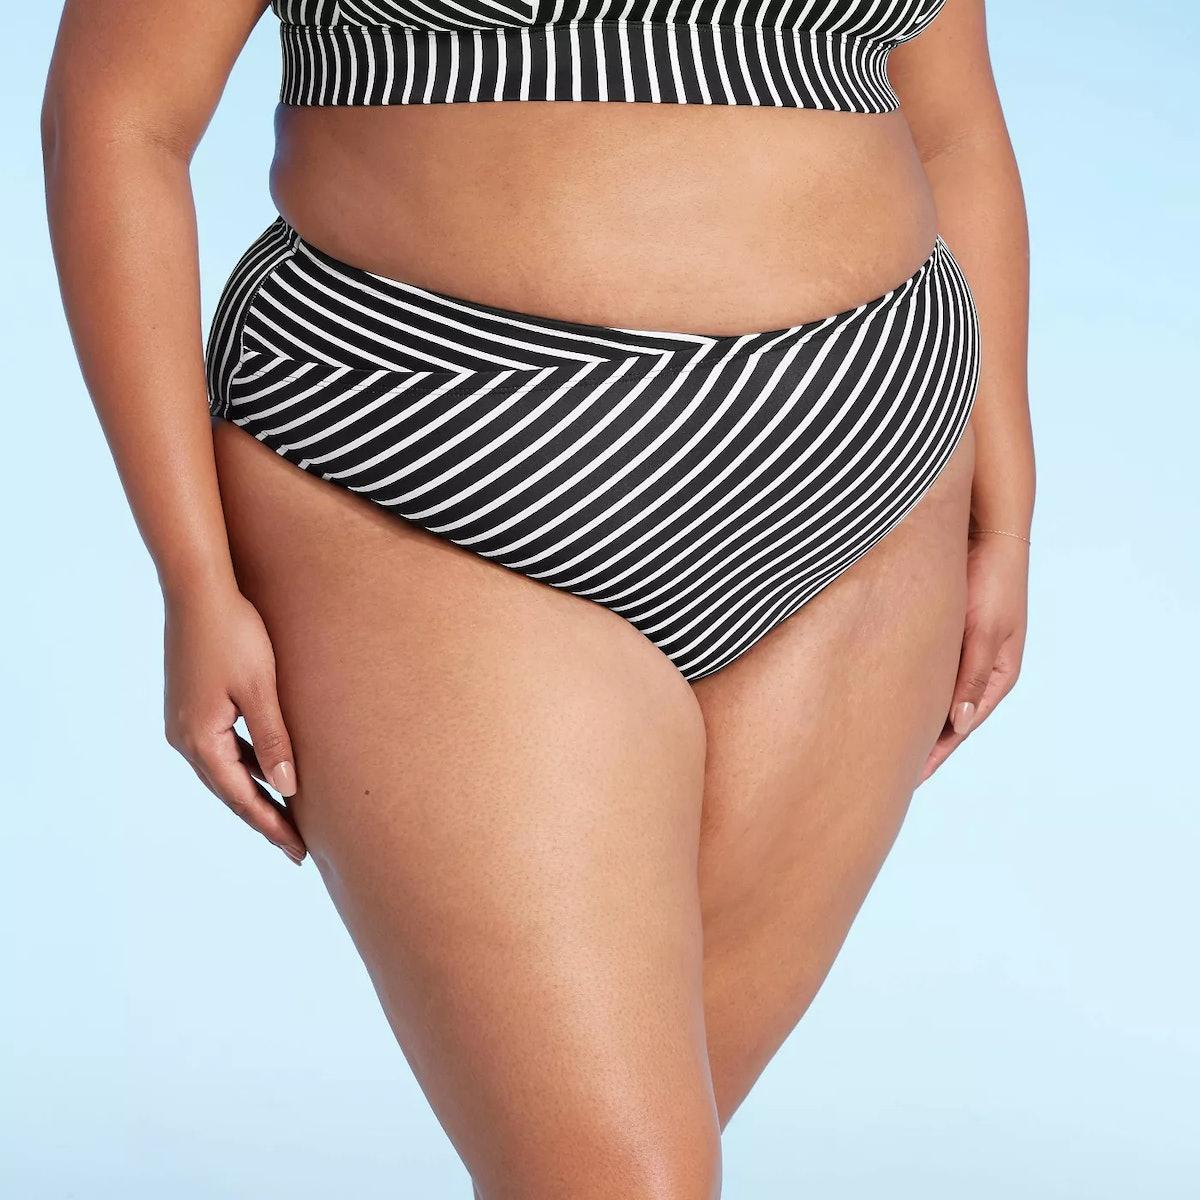 Kona Sol Women's Plus Size High Waist Bikini Bottom